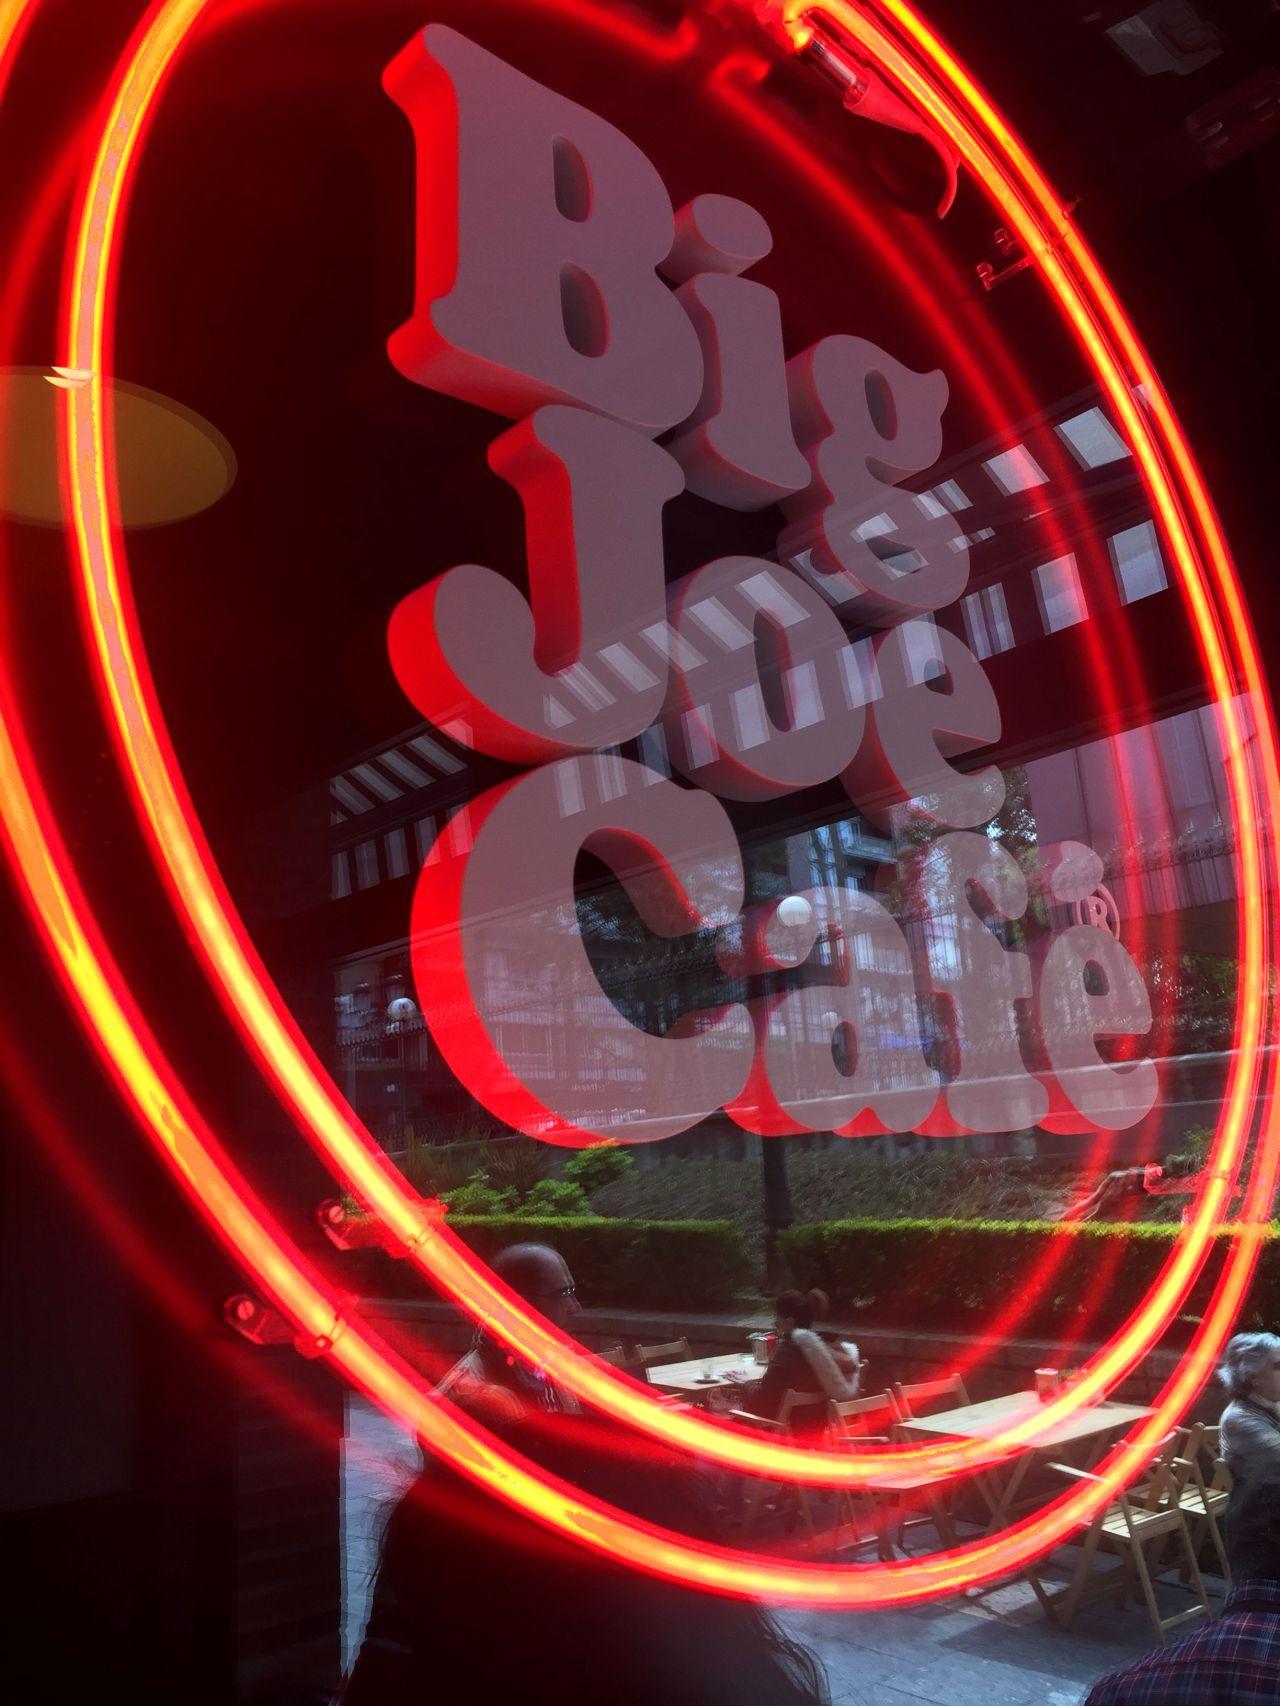 Big Joe Café